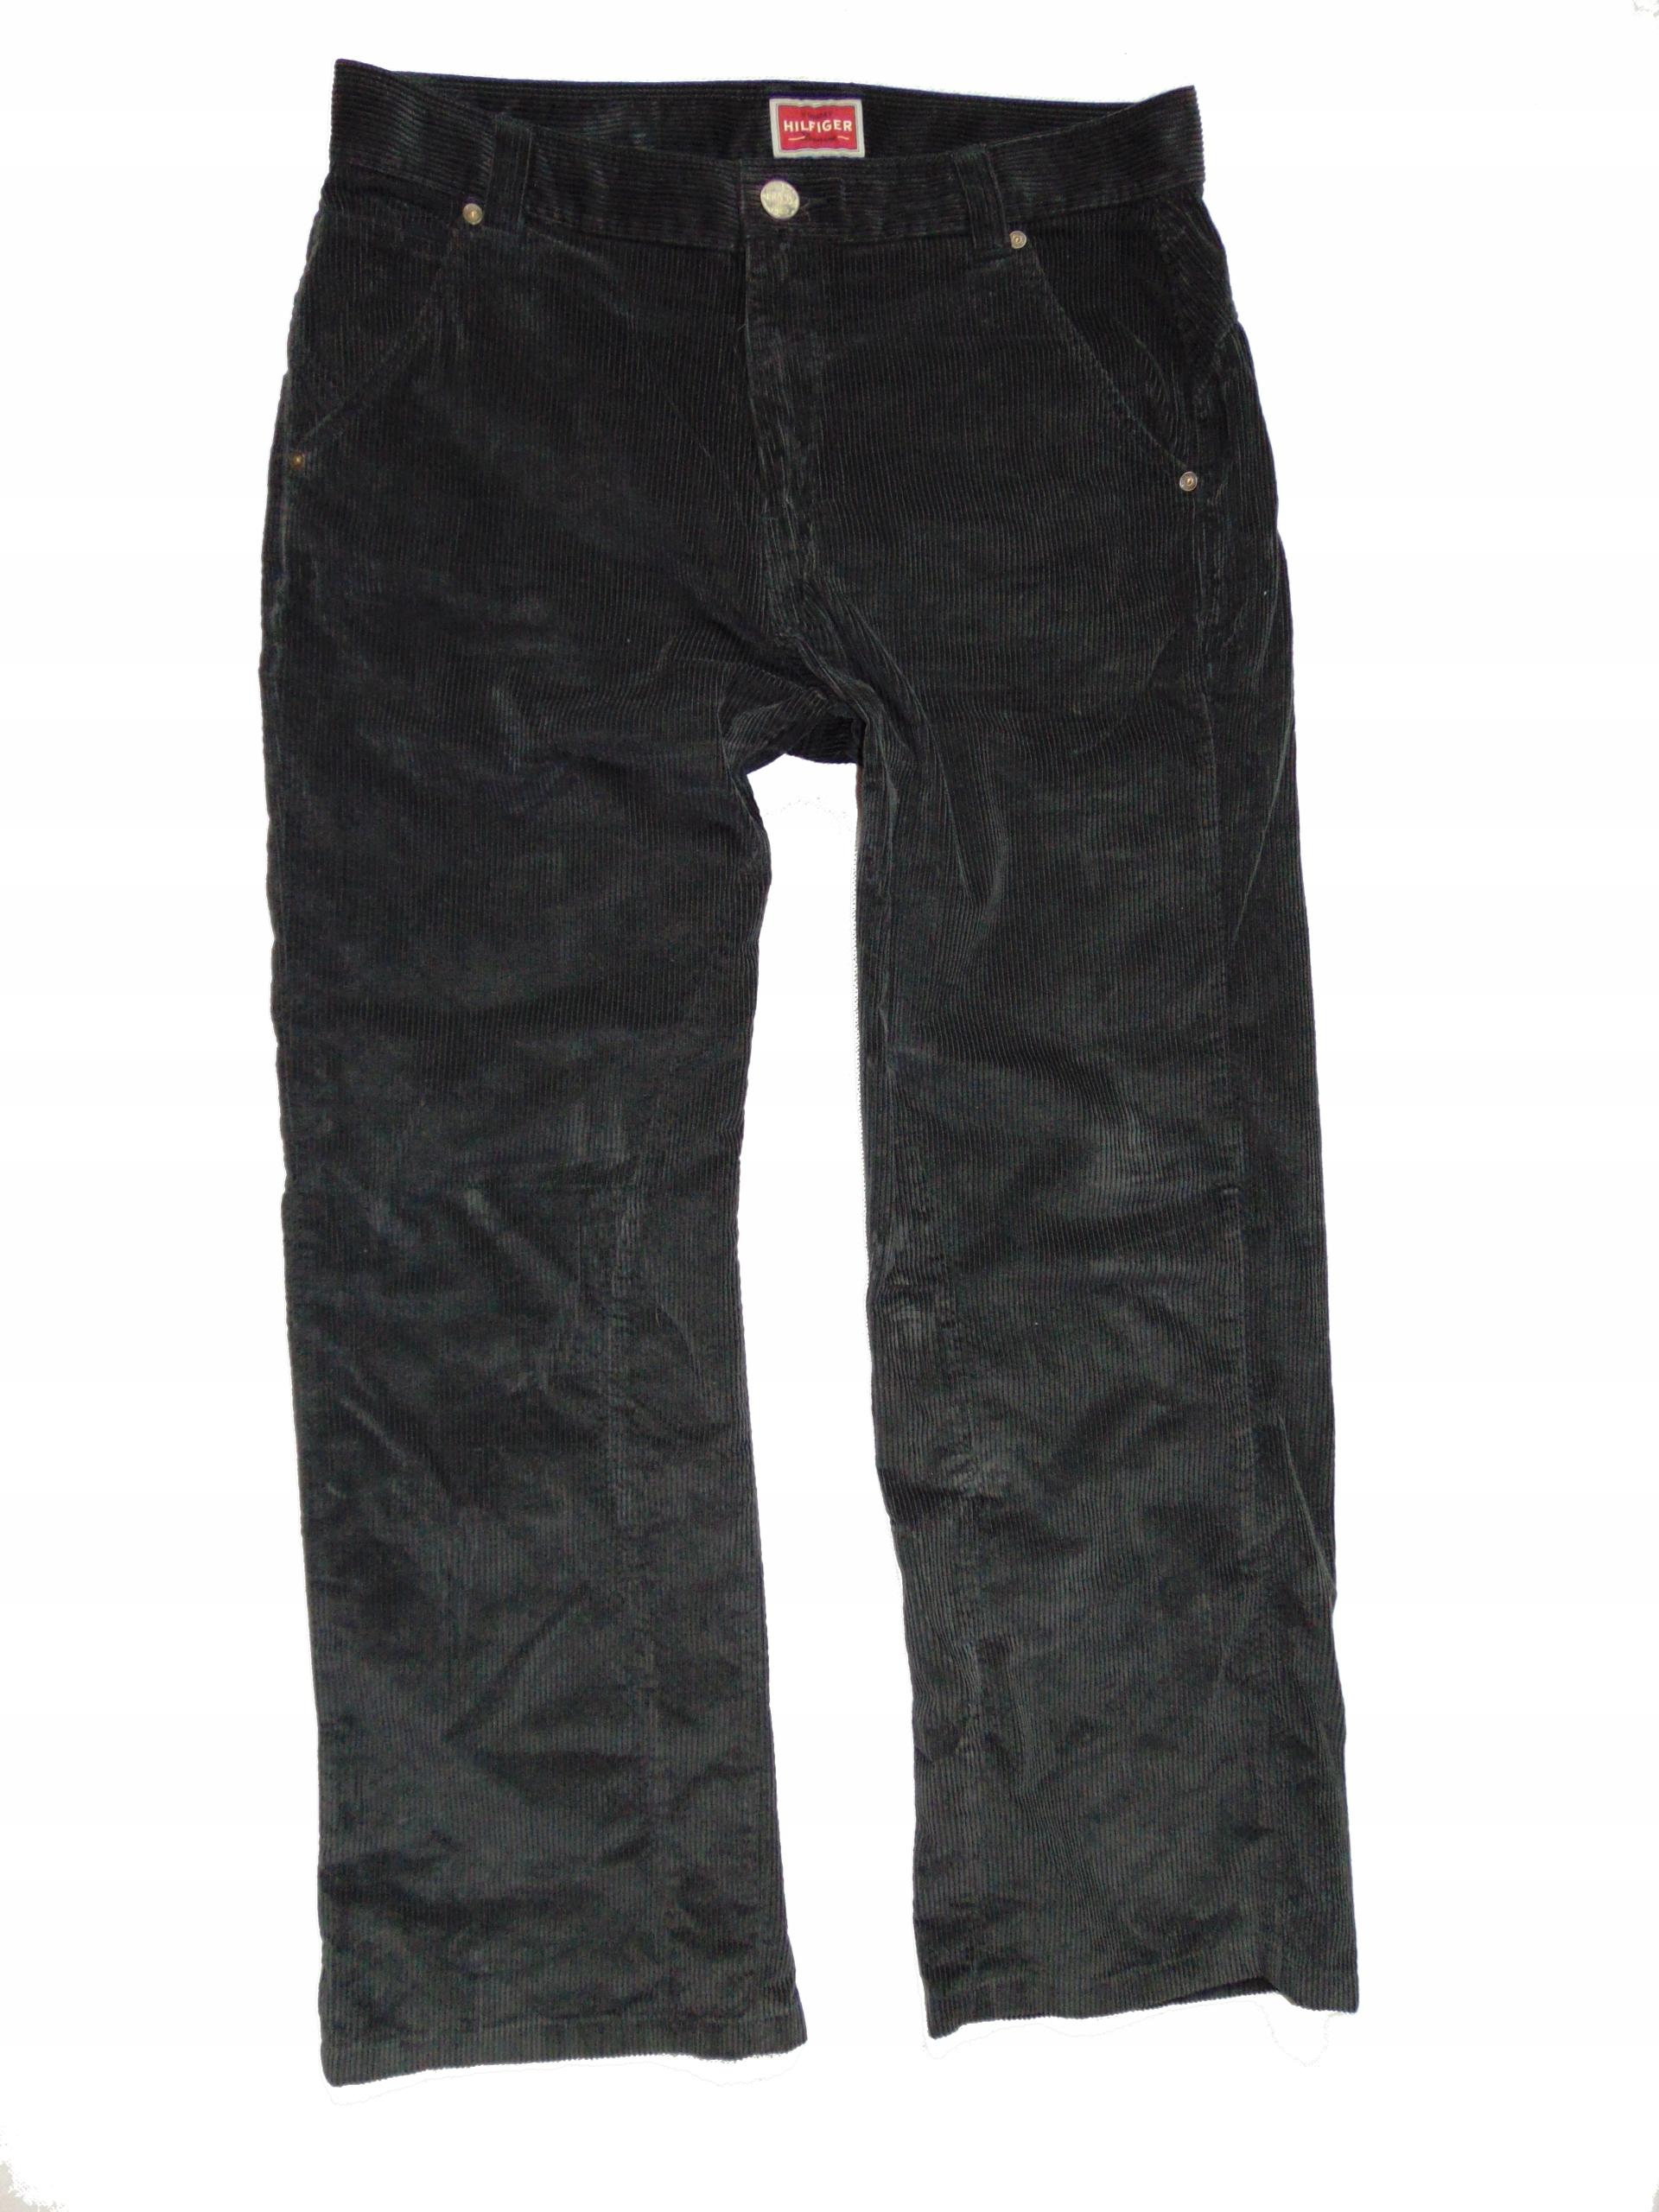 TOMMY HILFIGER spodnie męskie sztruksy r 34